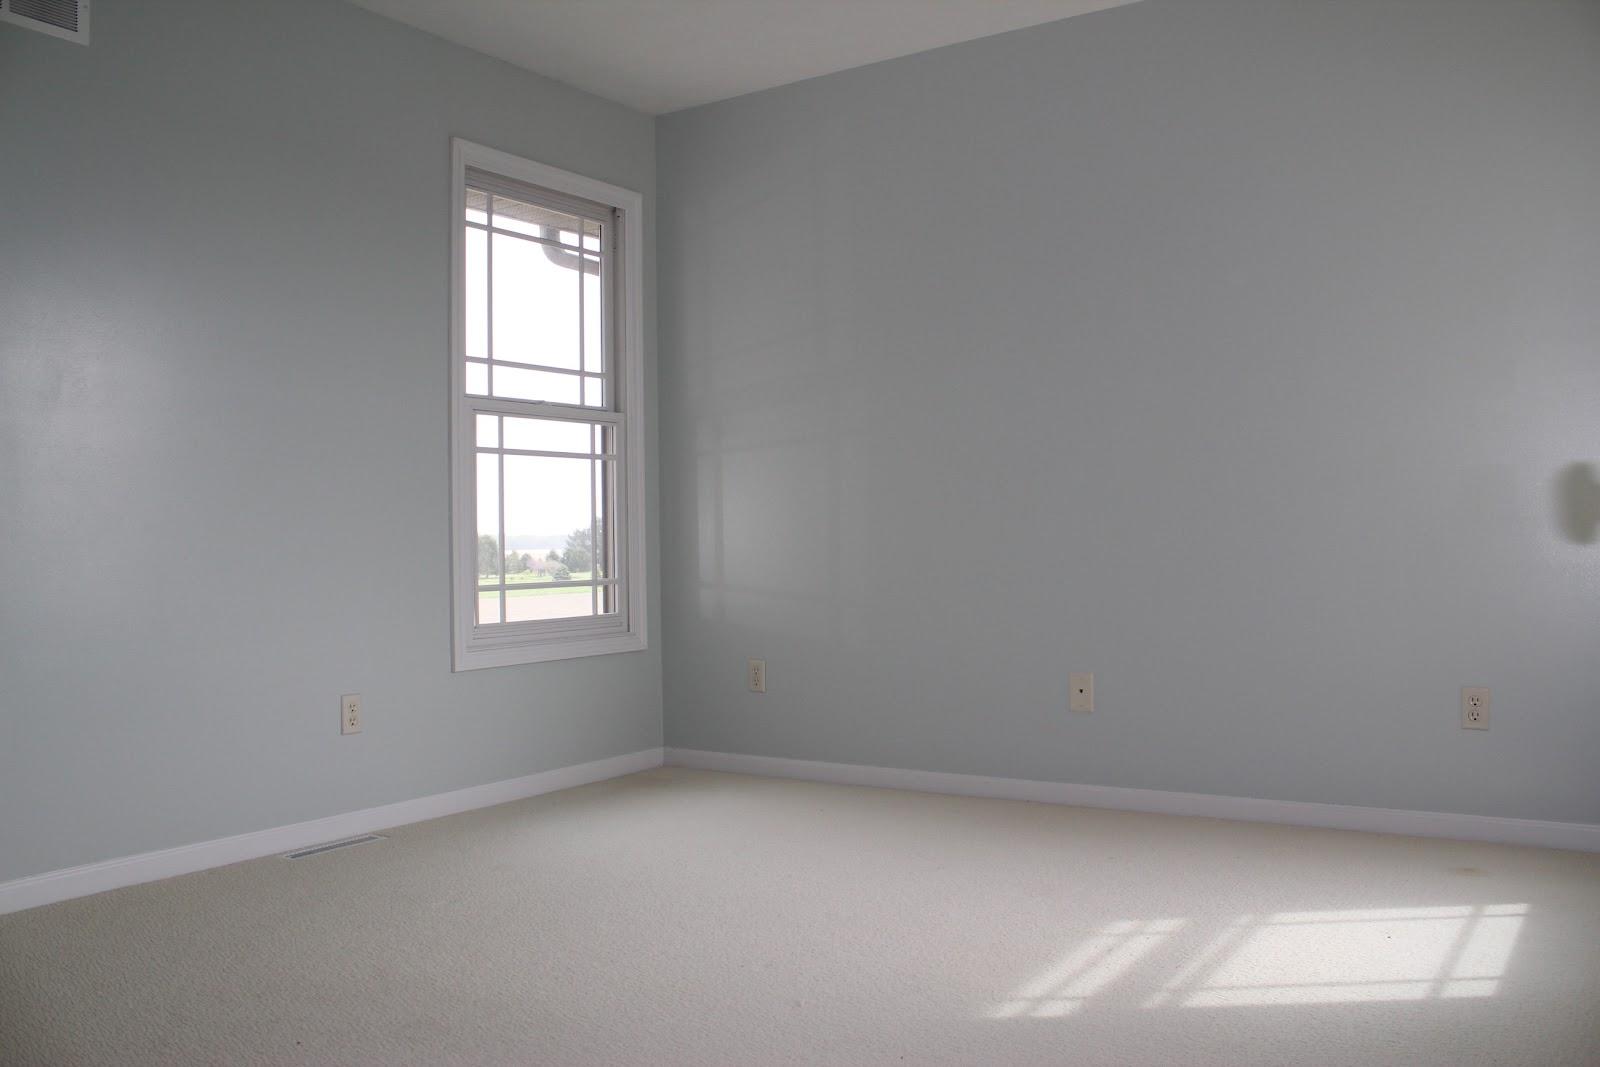 fashionable farmhouse painting progress. Black Bedroom Furniture Sets. Home Design Ideas